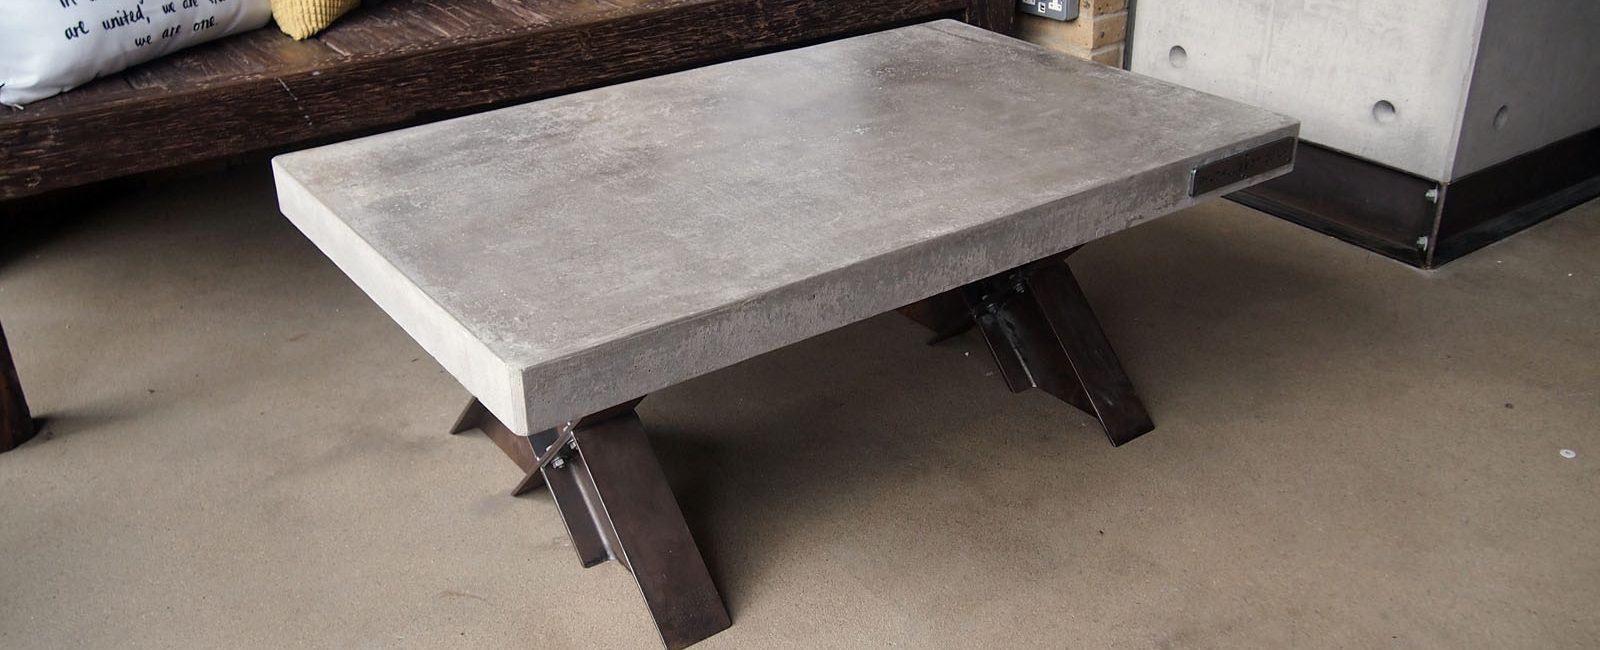 Concrete And Steel Furniture Brutal Design London